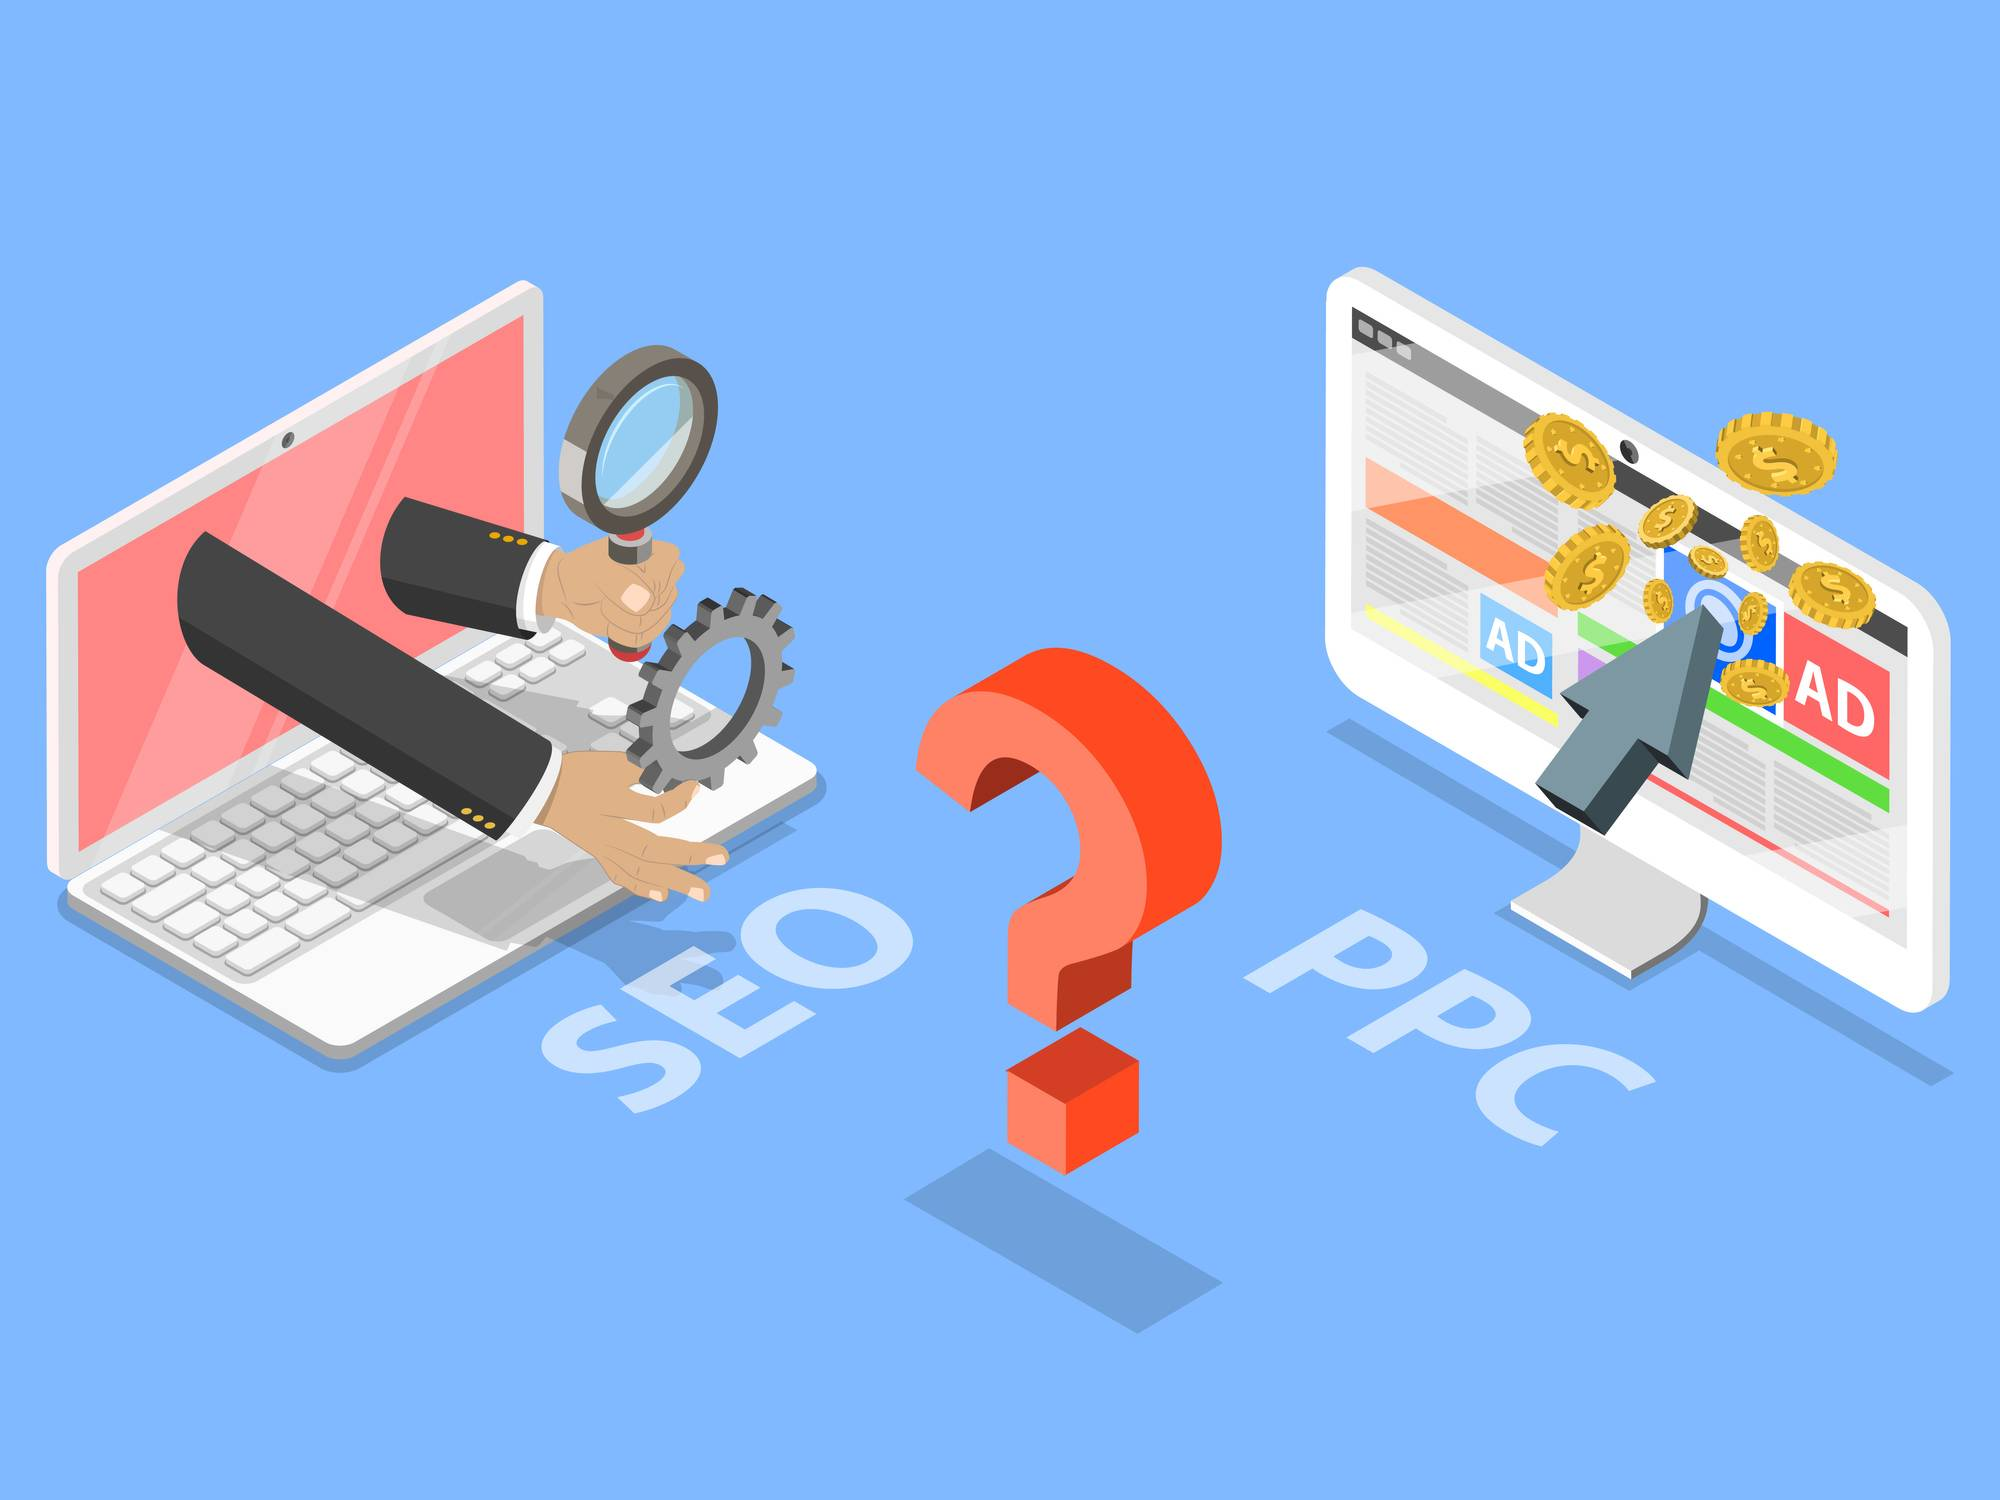 B2B Lead Generation Strategy: Comparing SEO vs. PPC